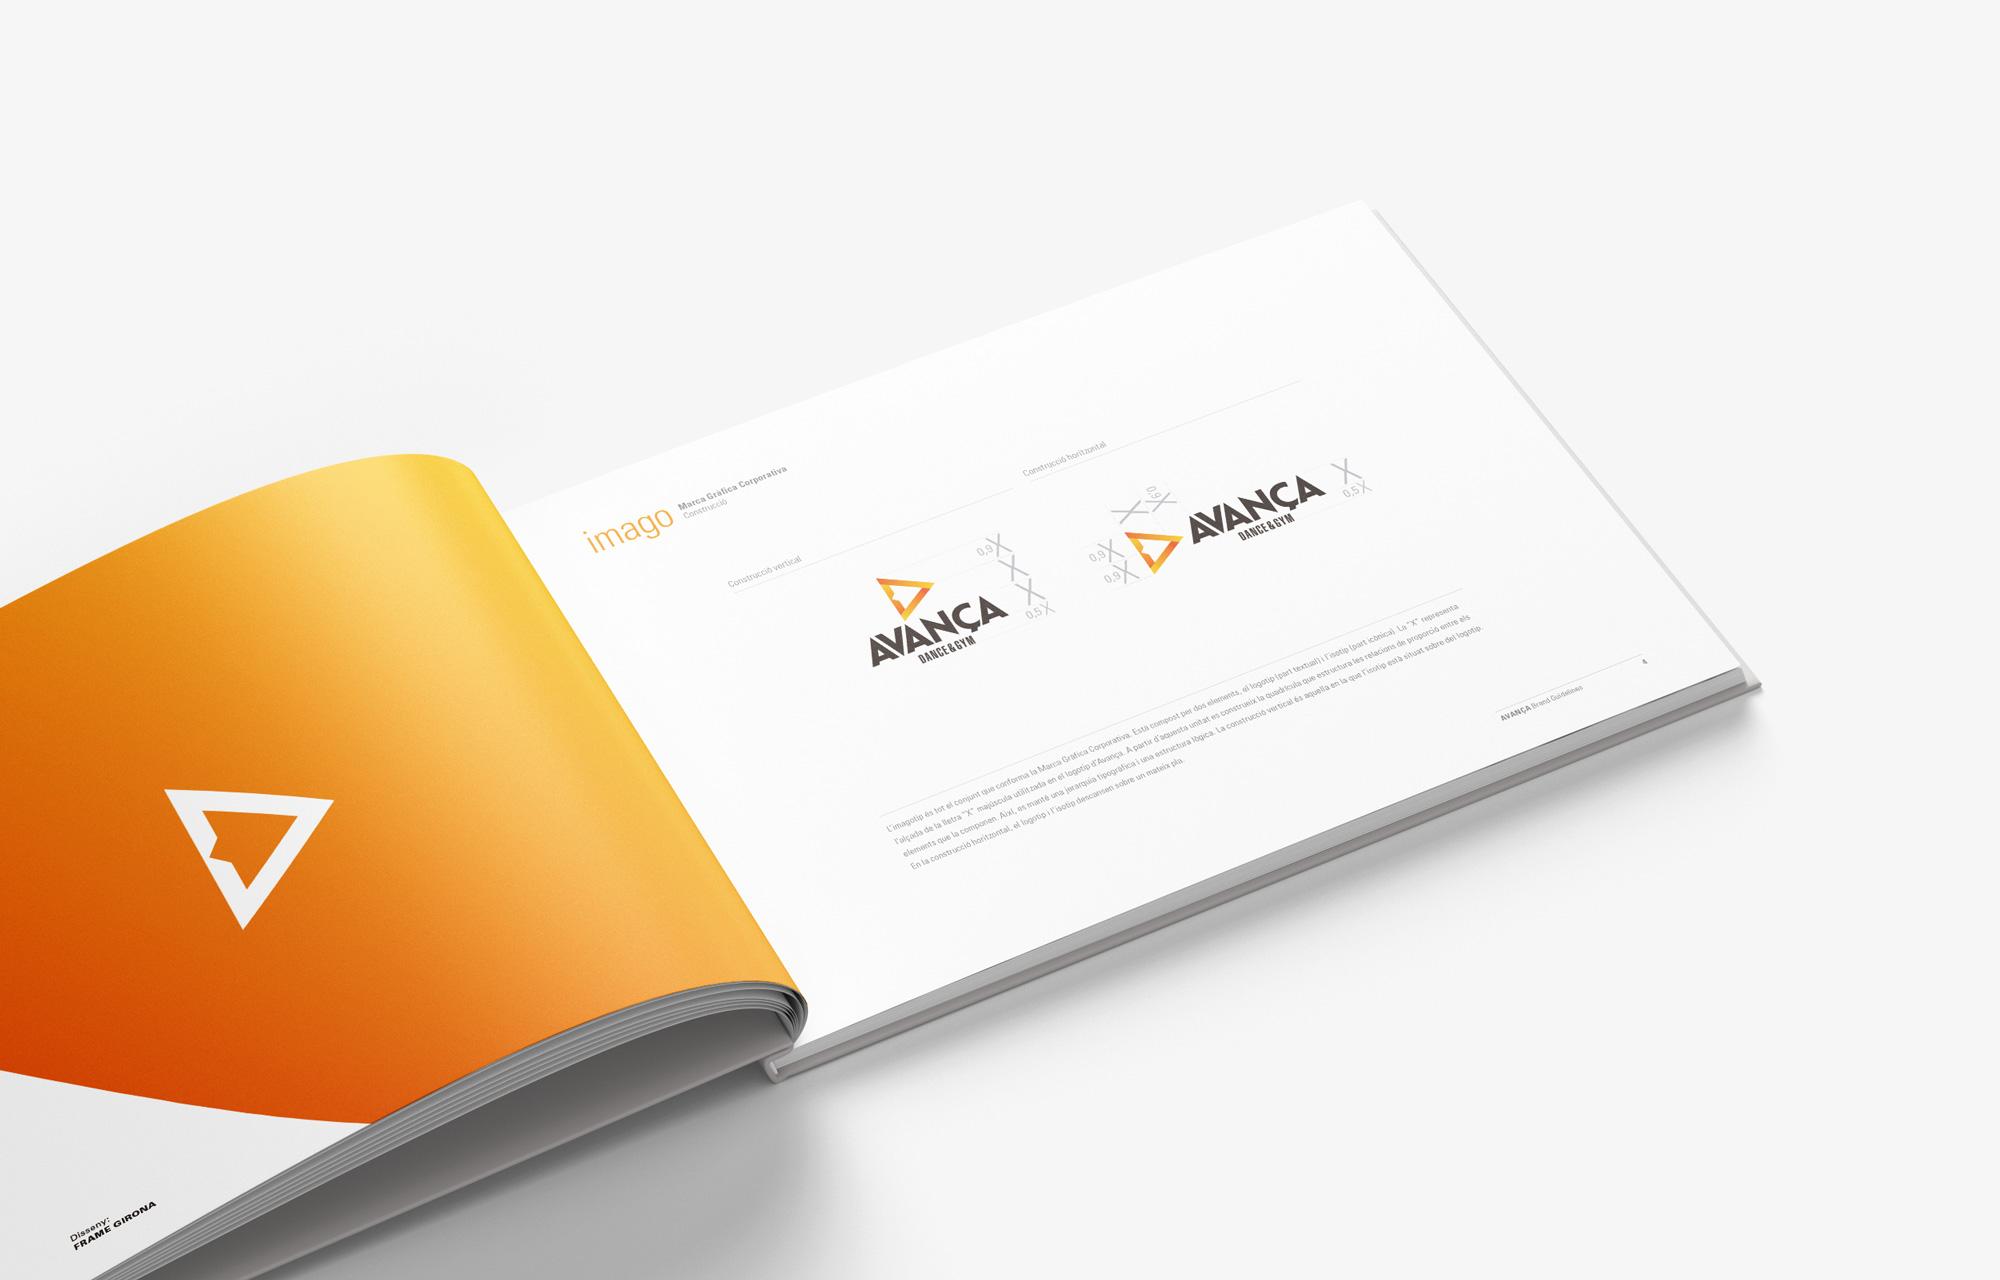 Avança Brand Guidelines - Pàgina Interior